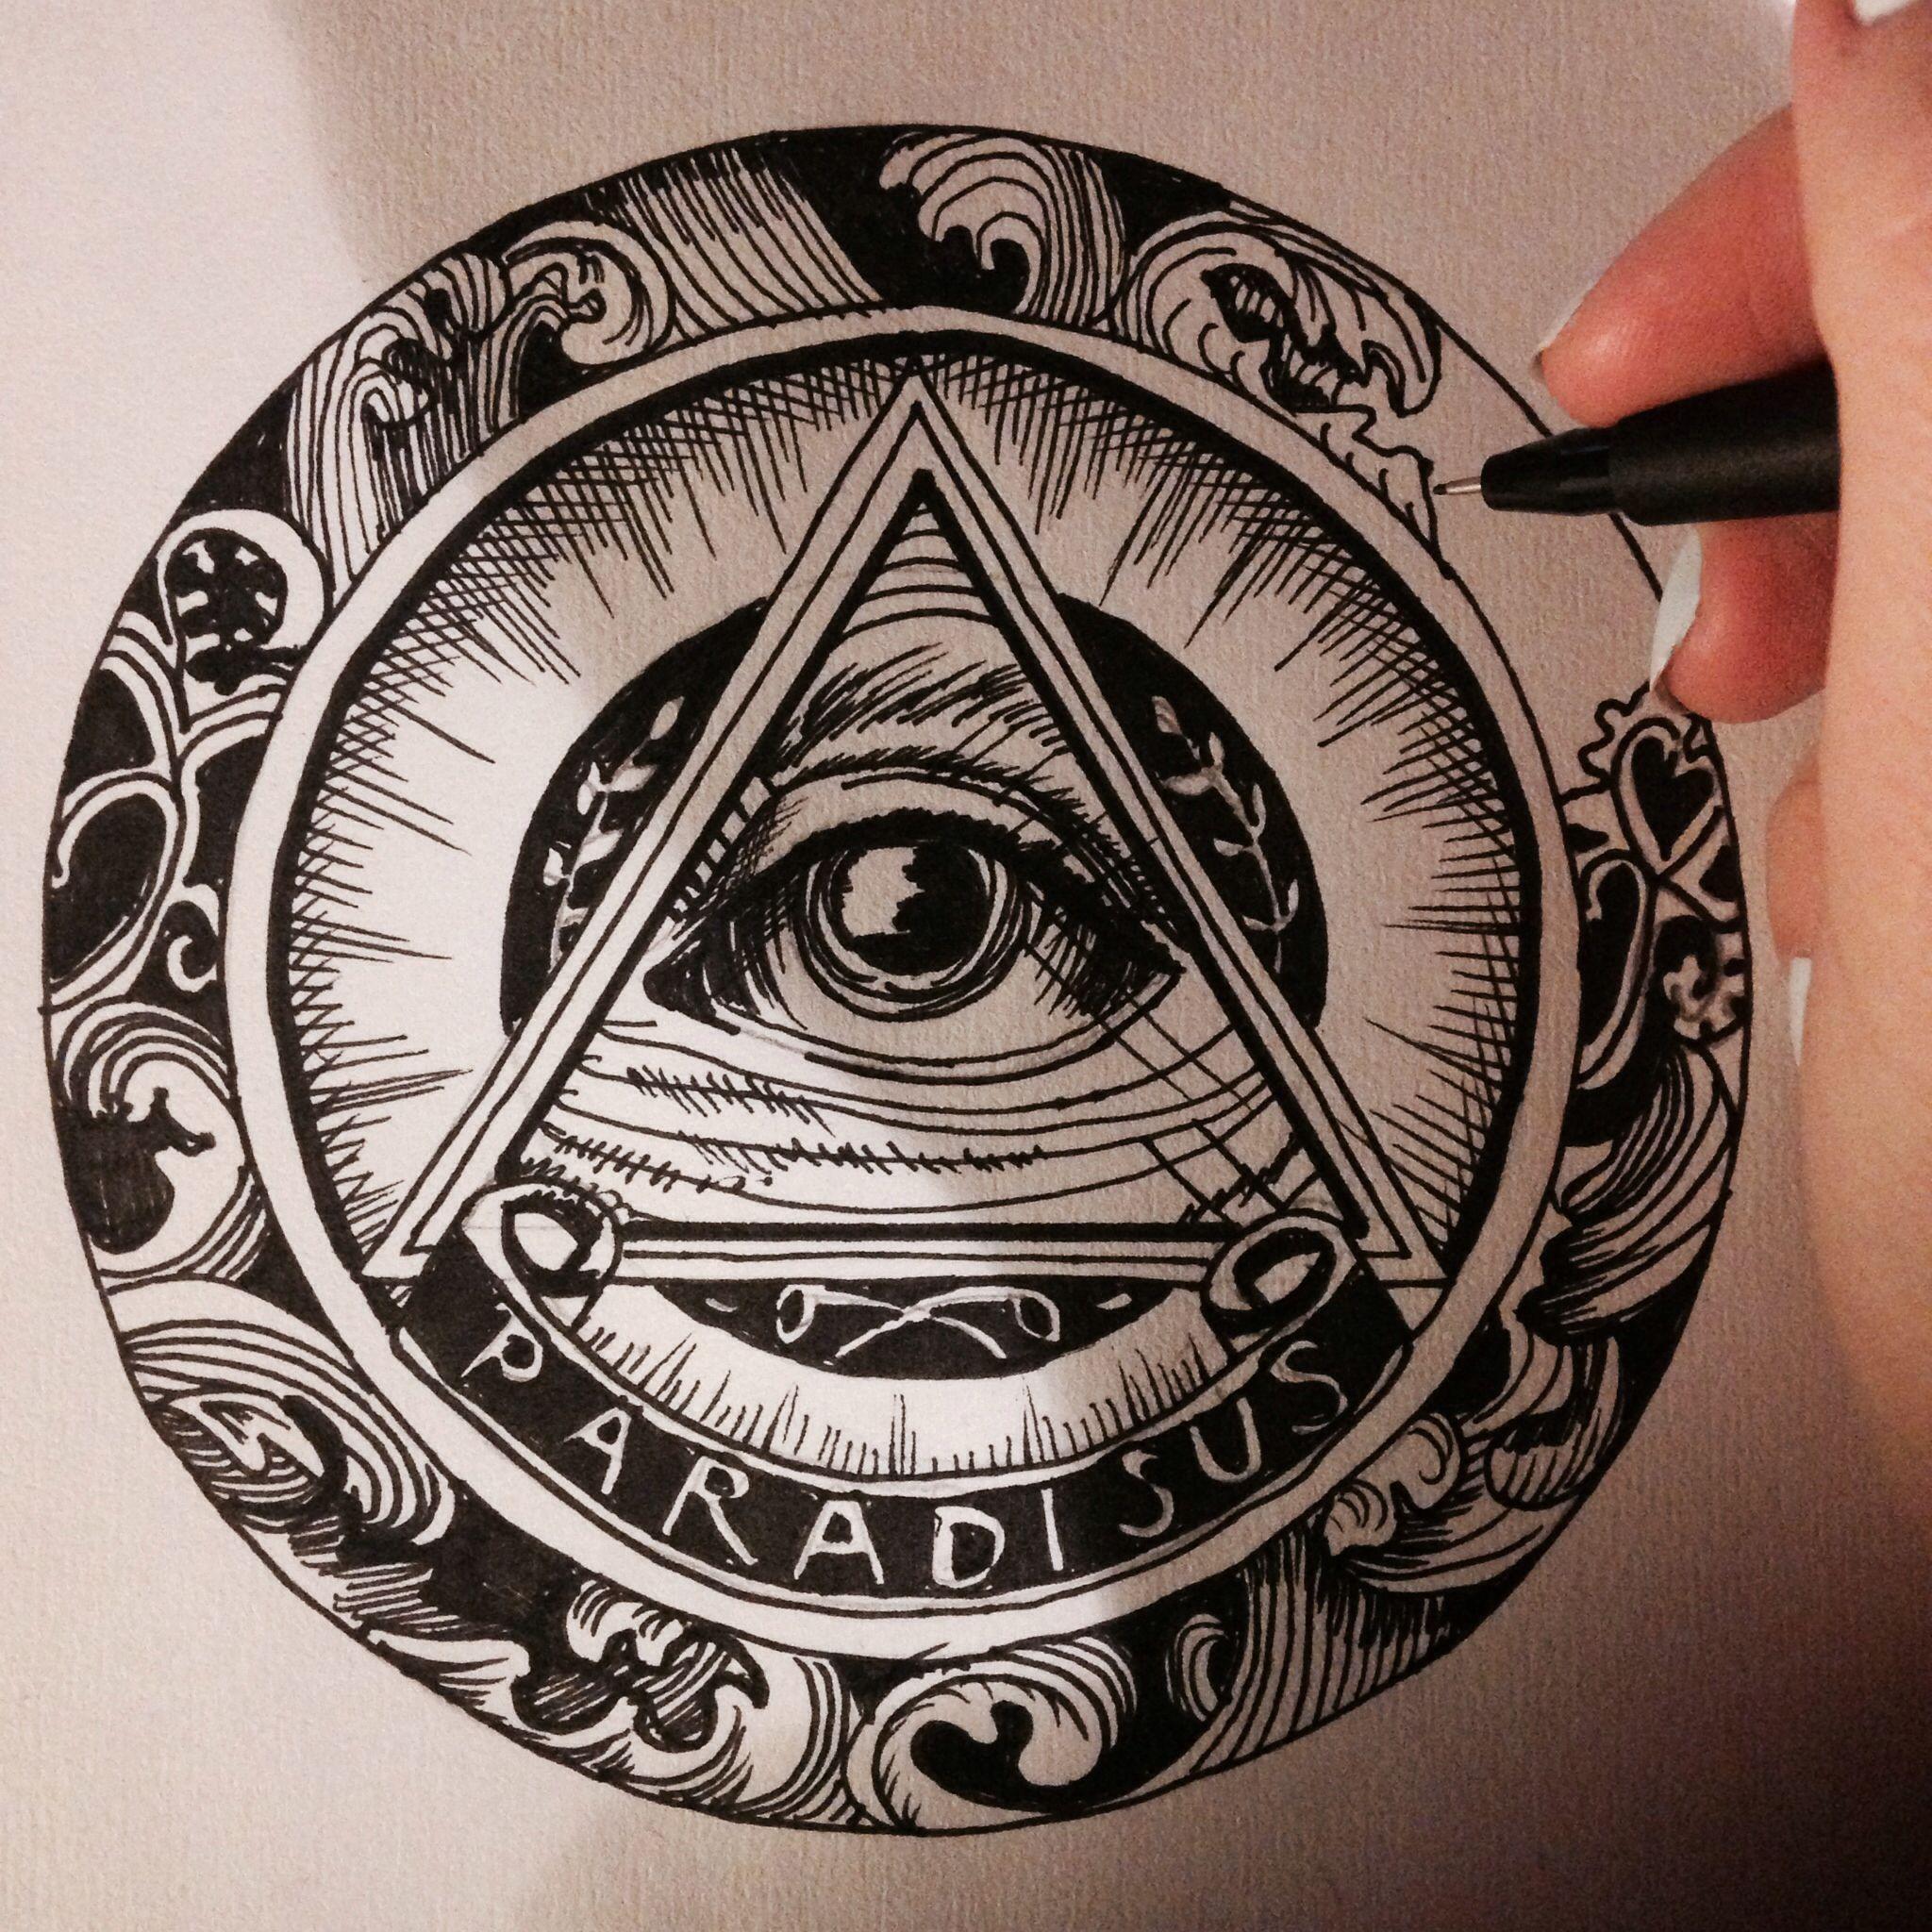 2048x2048 All Seeing Eye, Hand Drawing Tatoos Hand Drawn